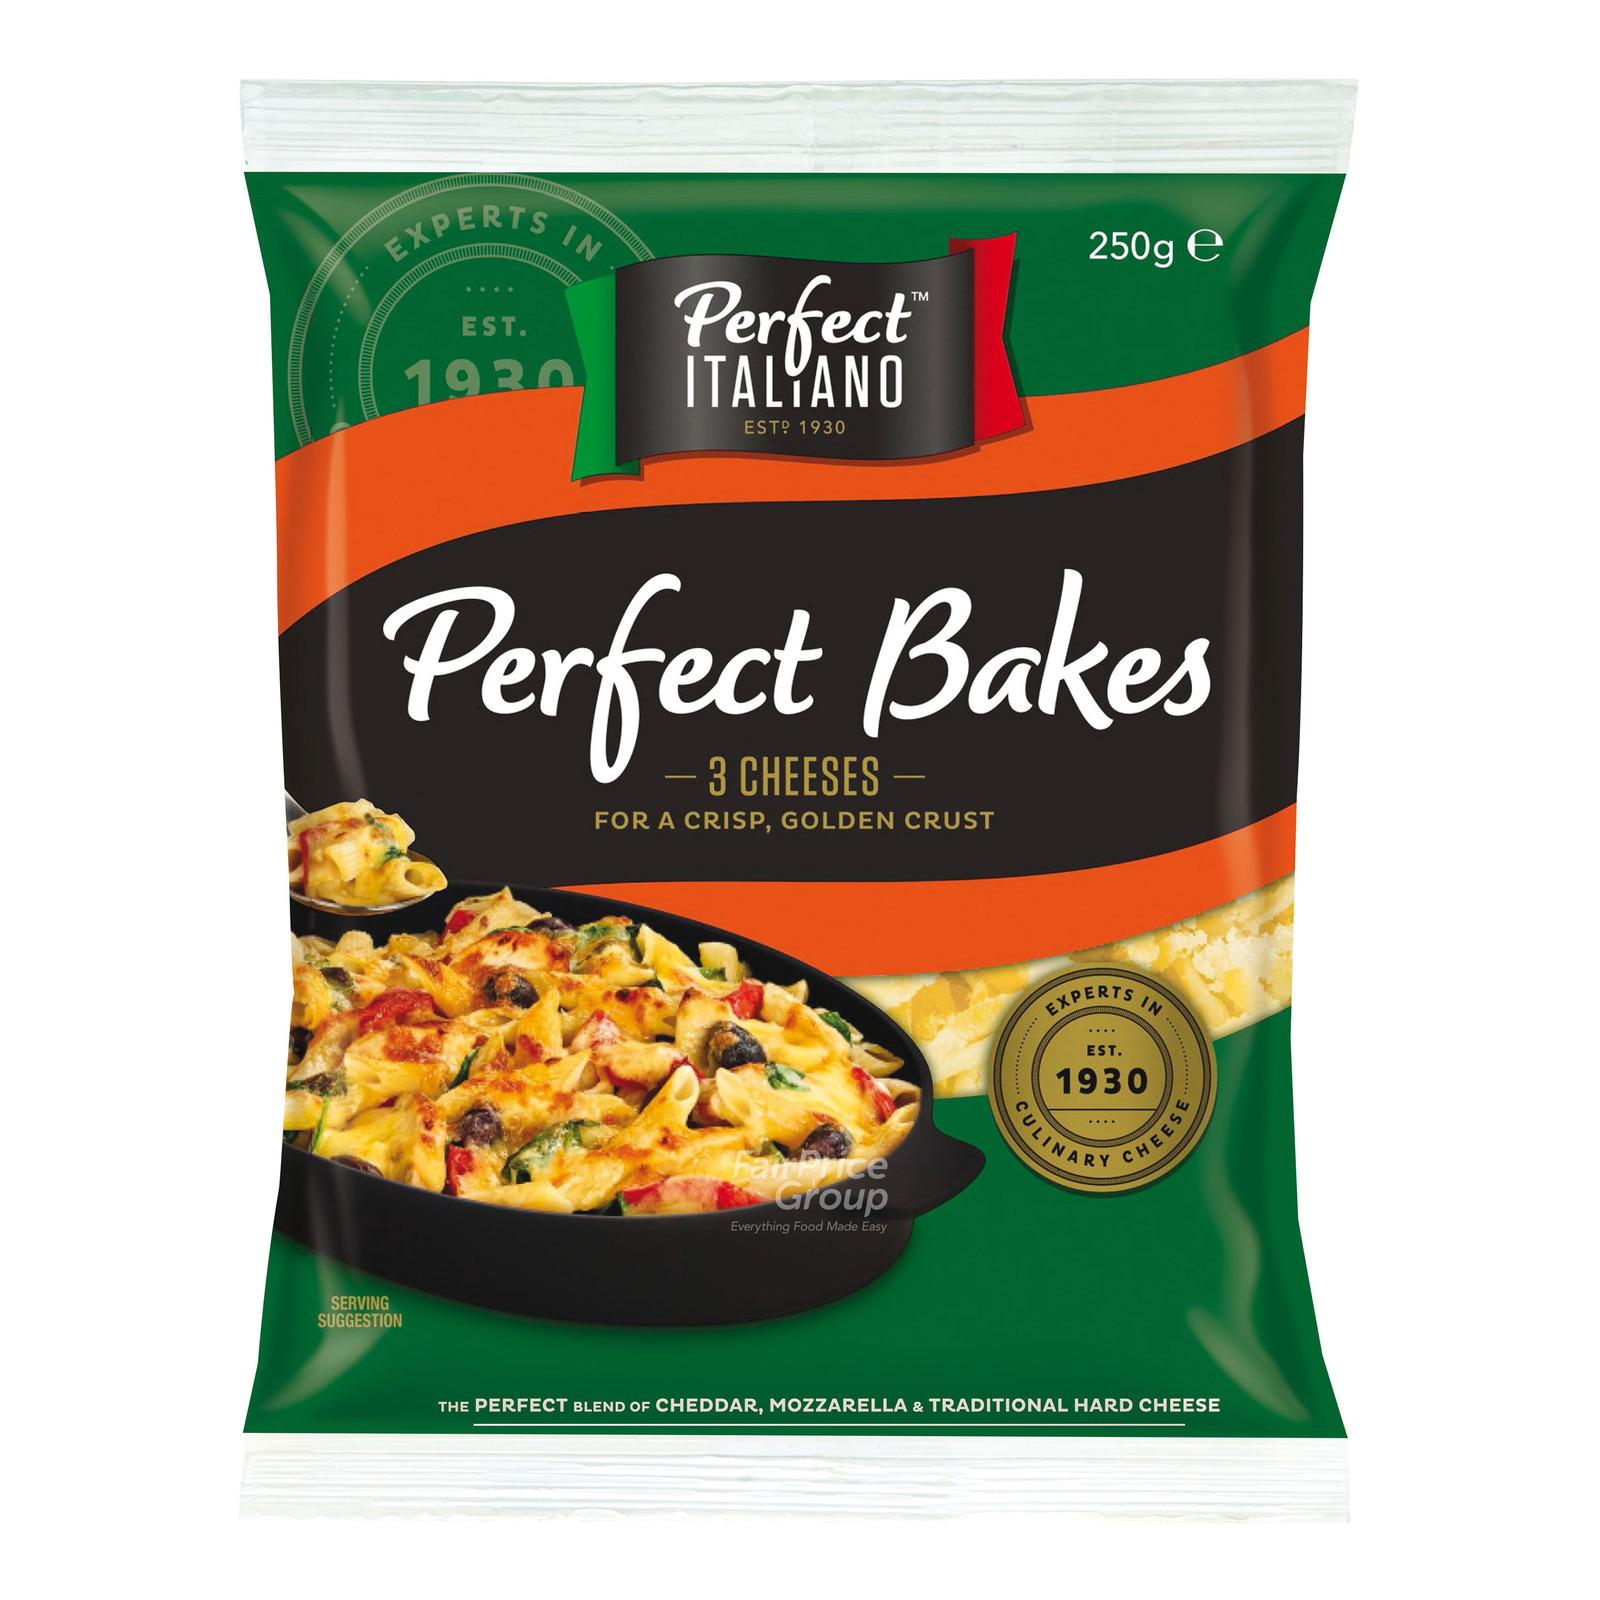 Perfect Italiano Cheese - Perfect Bakes